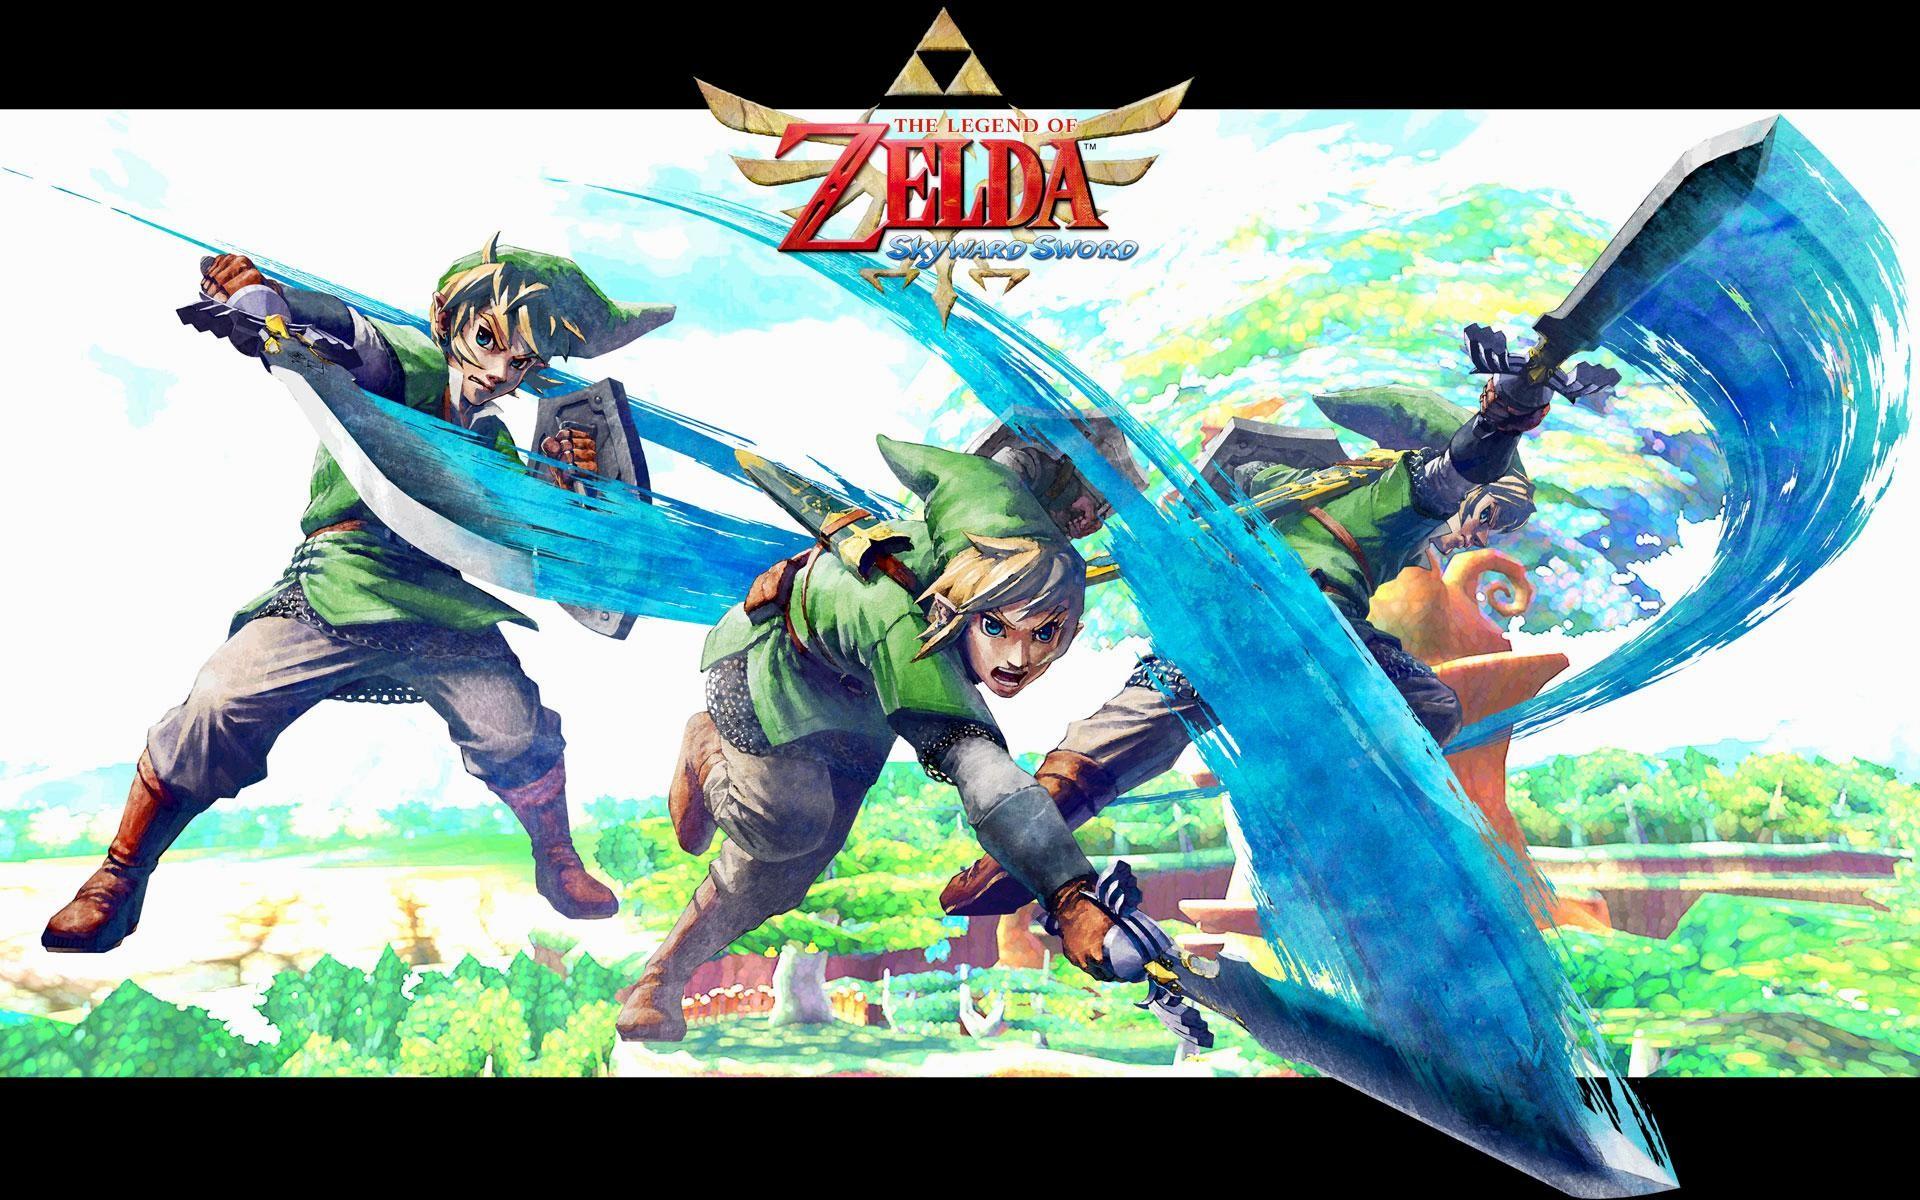 Main-Charater-Legend-of-Zelda-Wallpaper